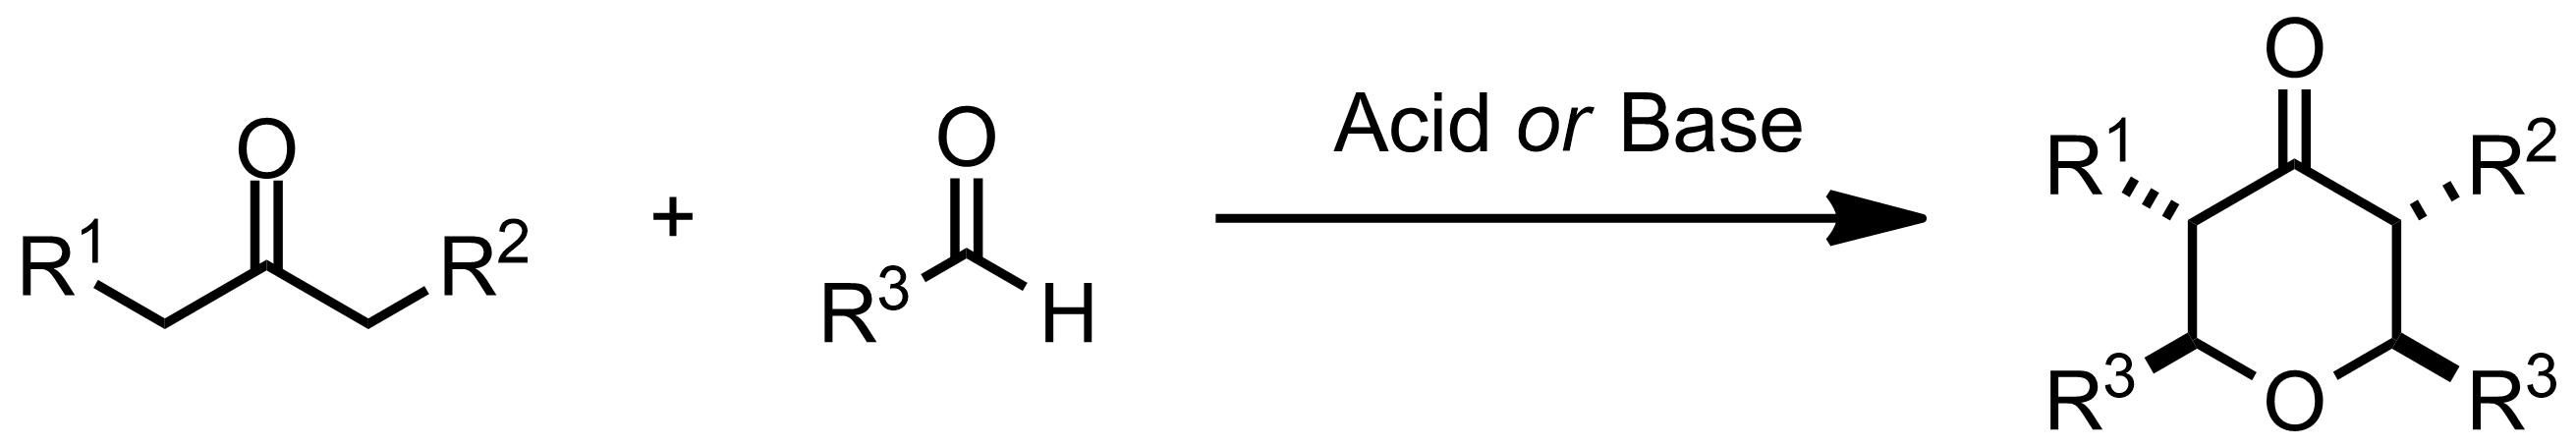 Schematic representation of the Maitland-Japp Reaction.